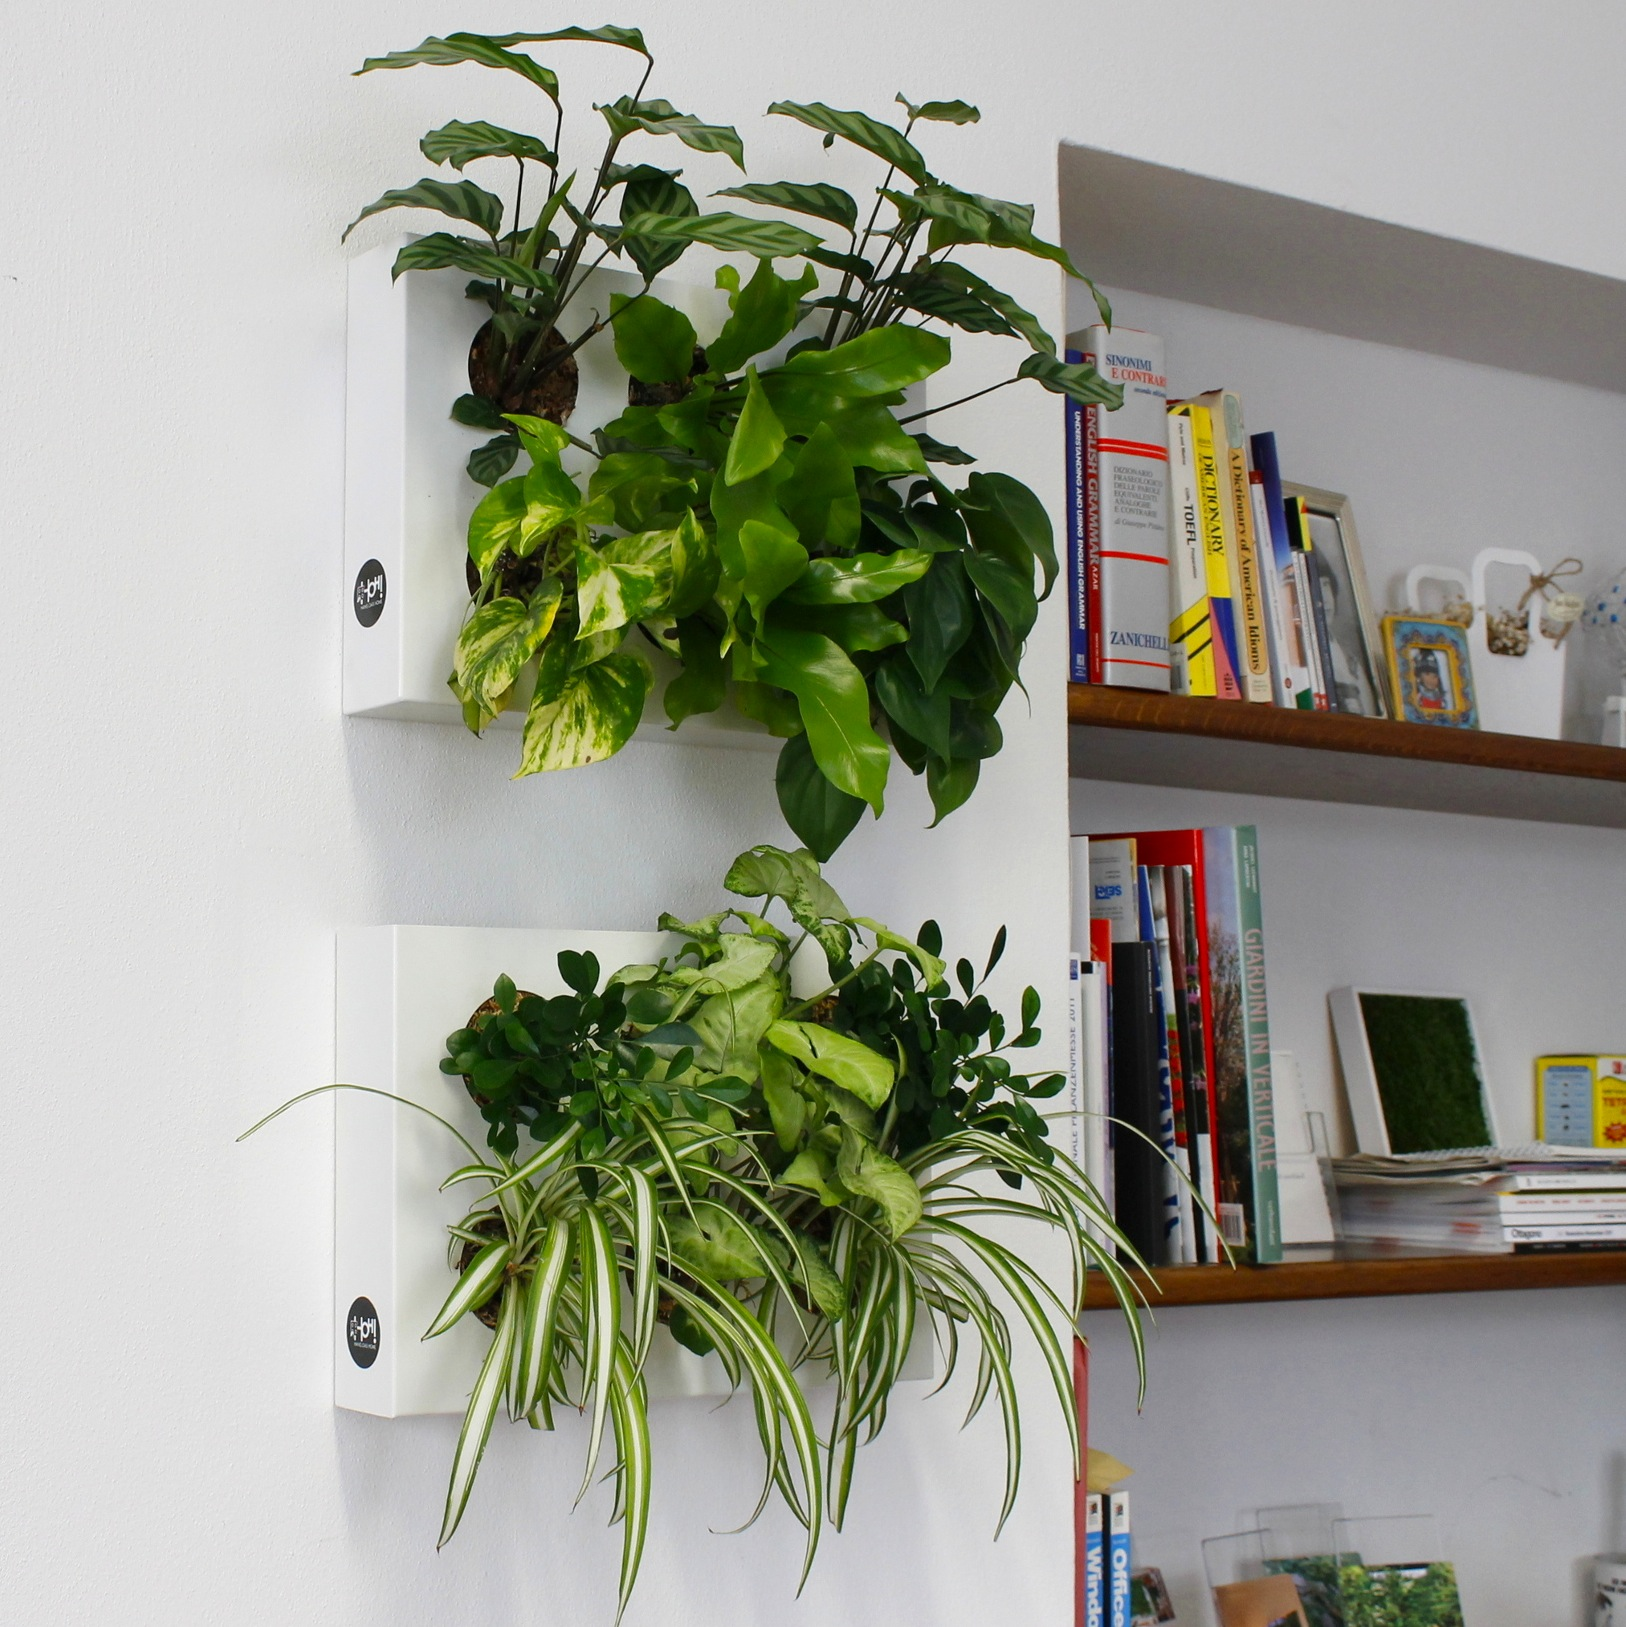 Giardini interni e pareti in verde verticale - Pareti verdi per interni ...